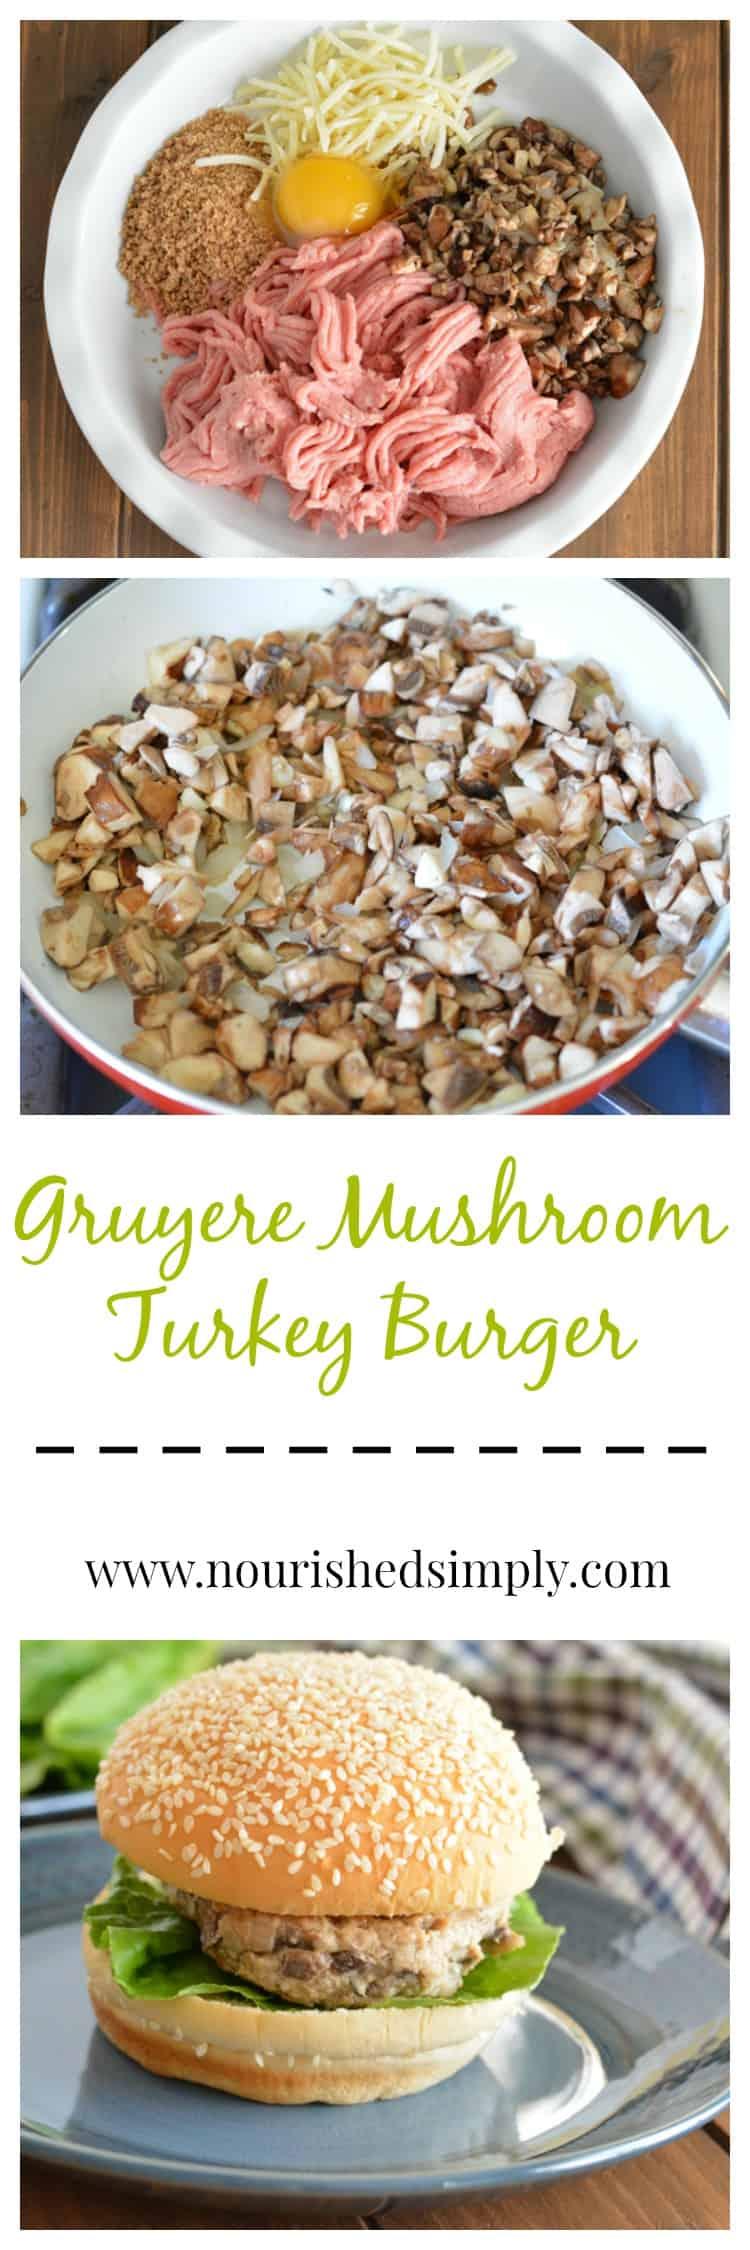 Gruyere Mushroom Turkey Burger